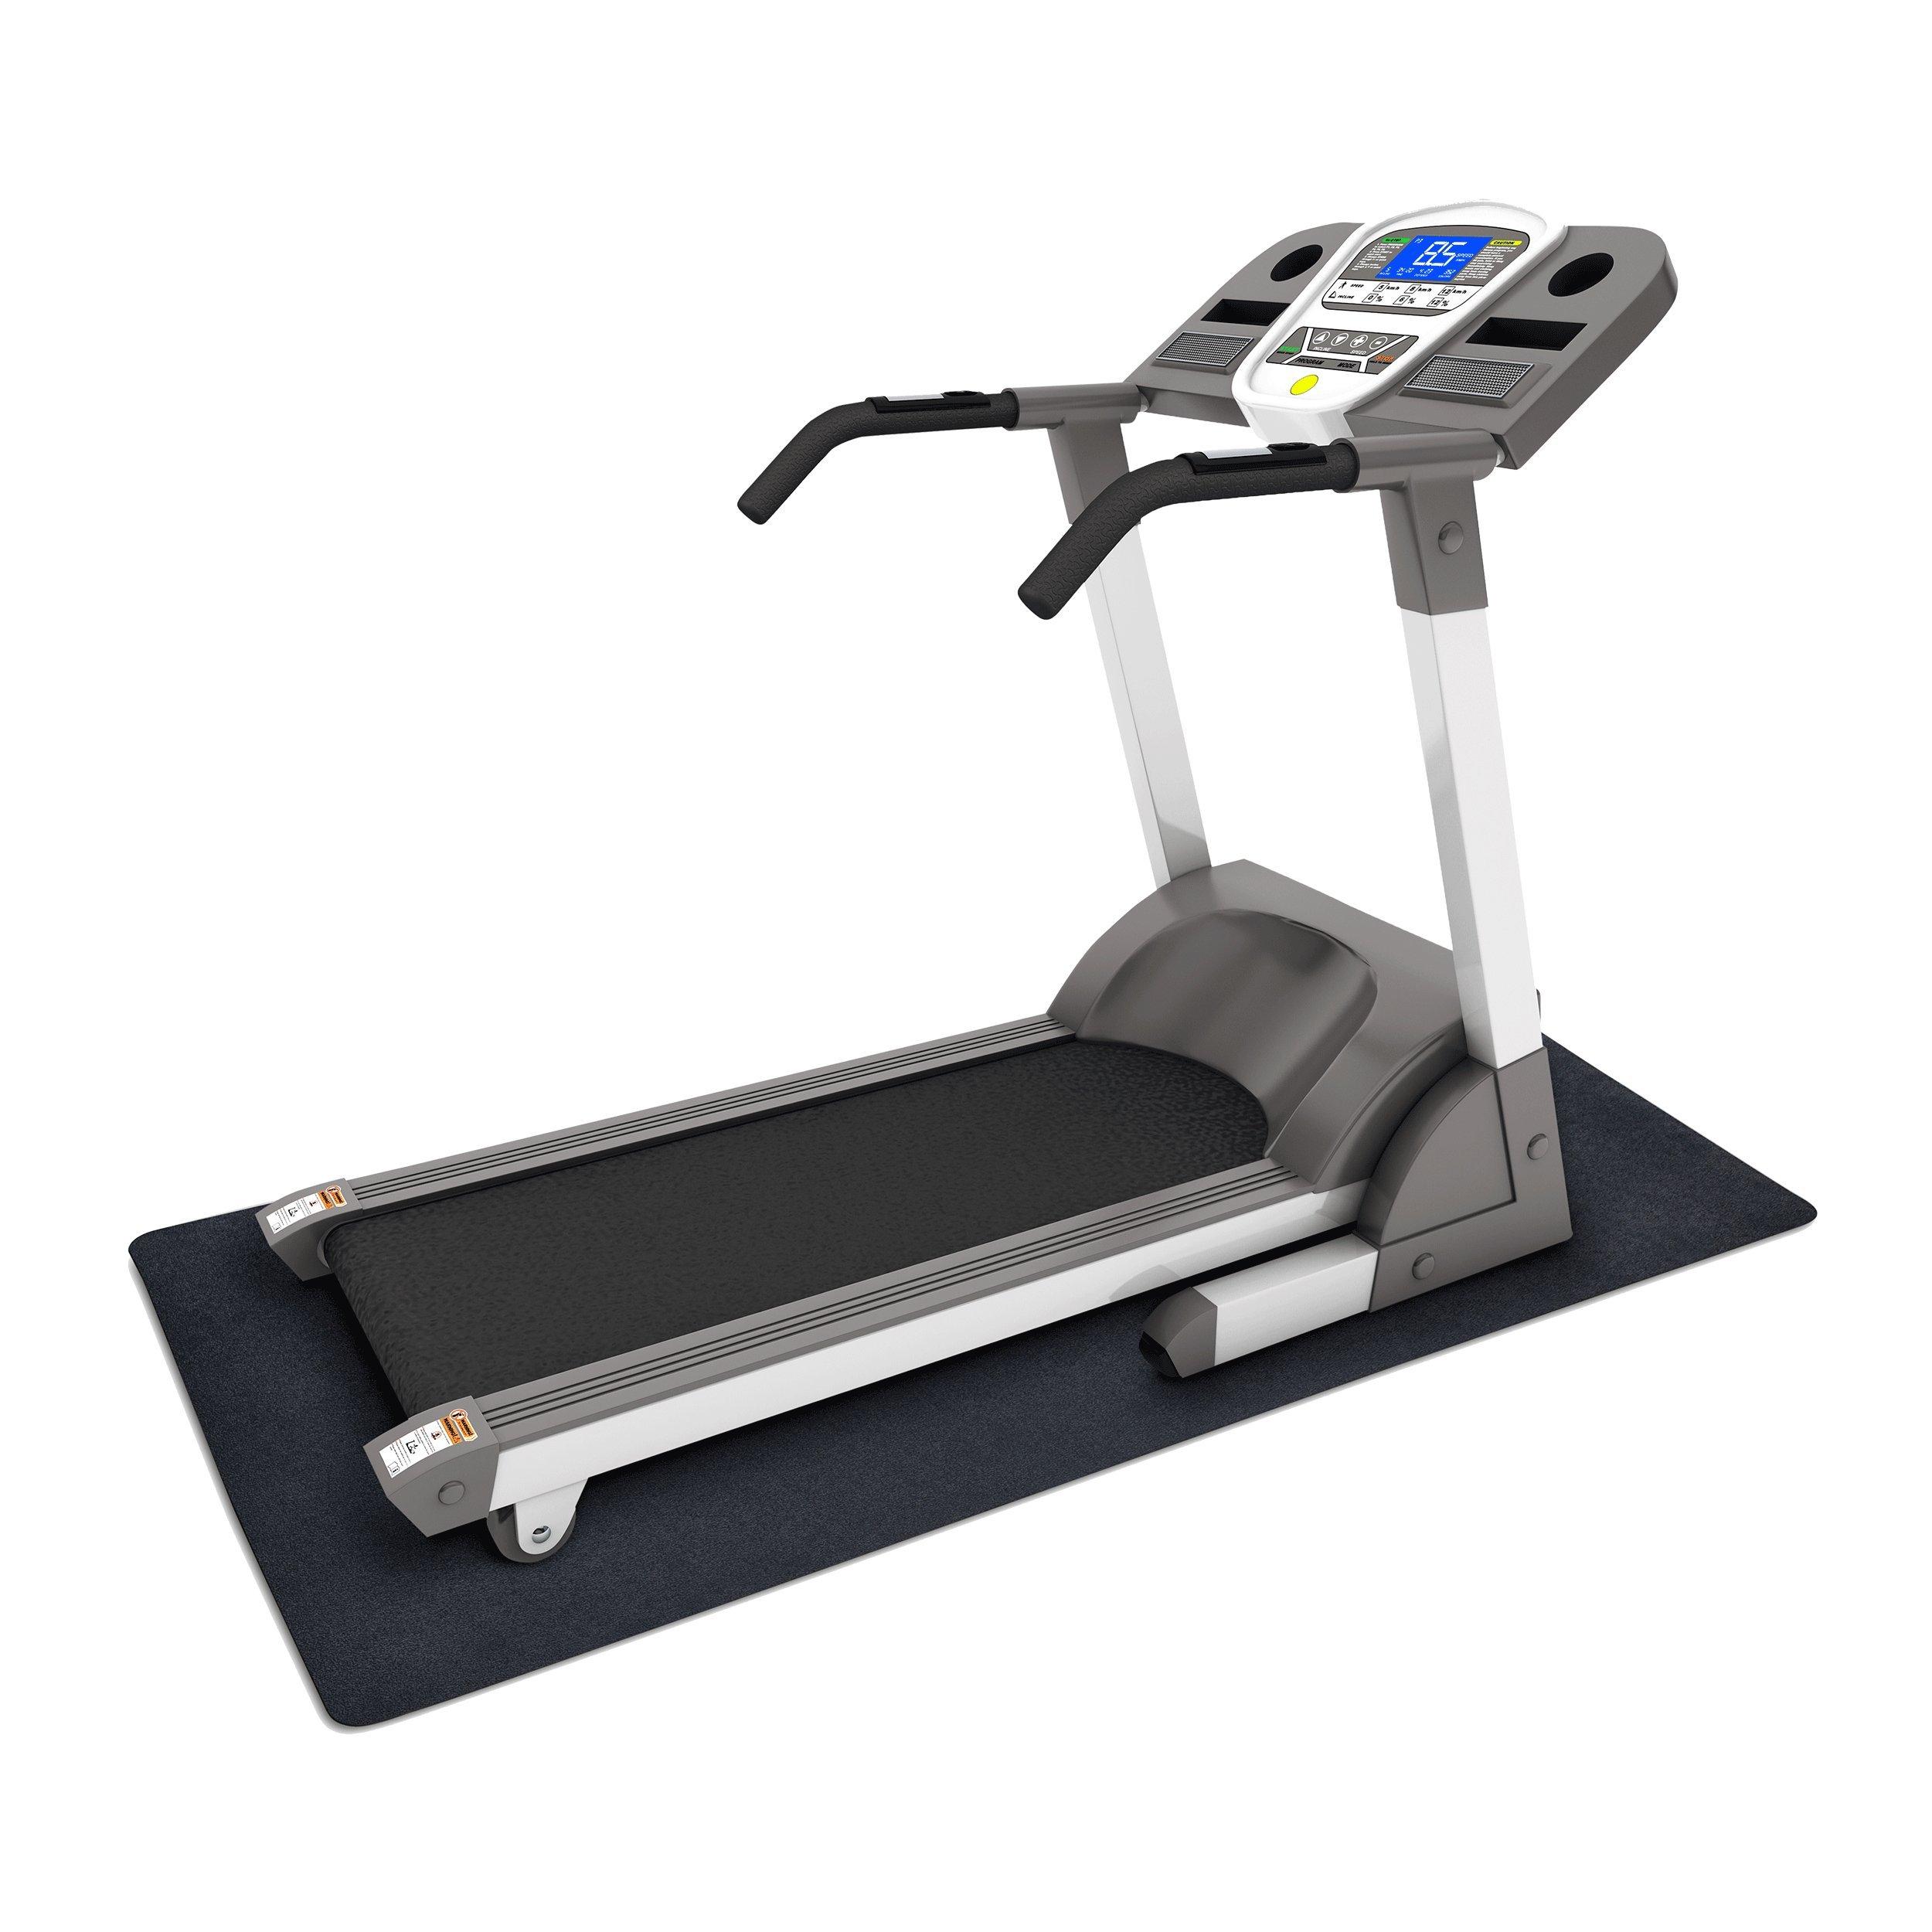 MotionTex 8M-110-36C-6 Fitness Equipment Mat, 36'' x 72'', Black